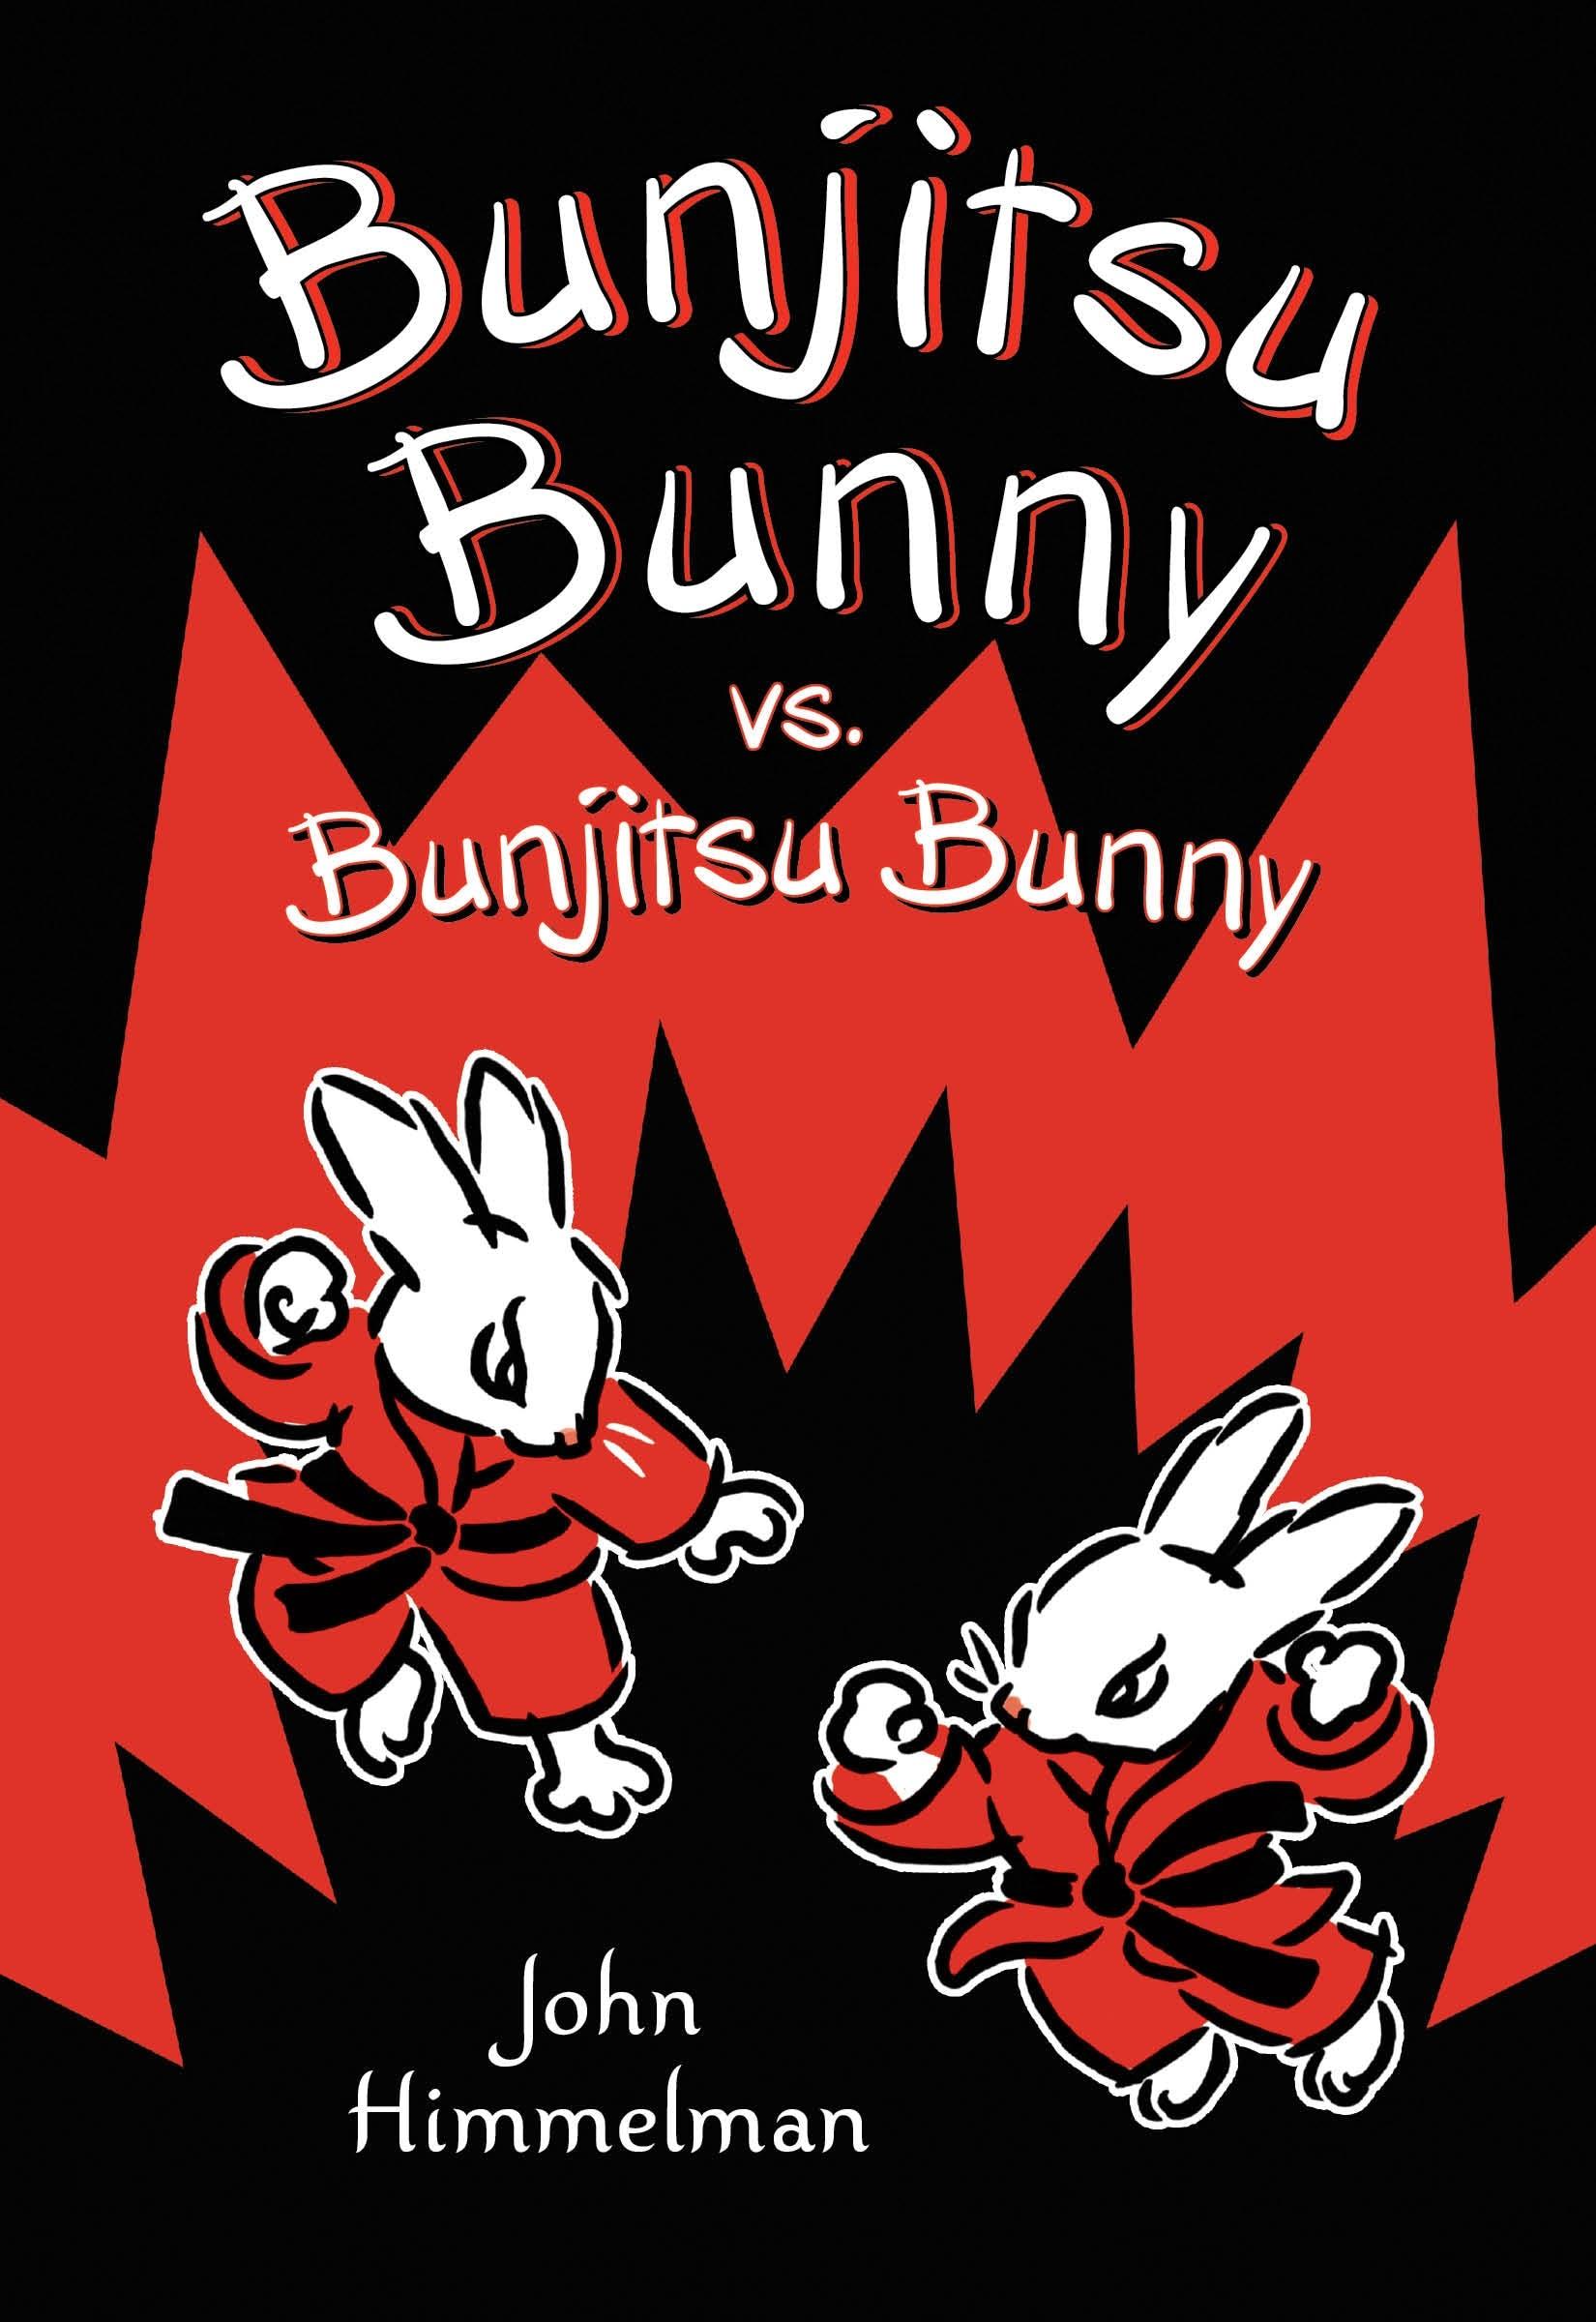 Image of Bunjitsu Bunny vs. Bunjitsu Bunny